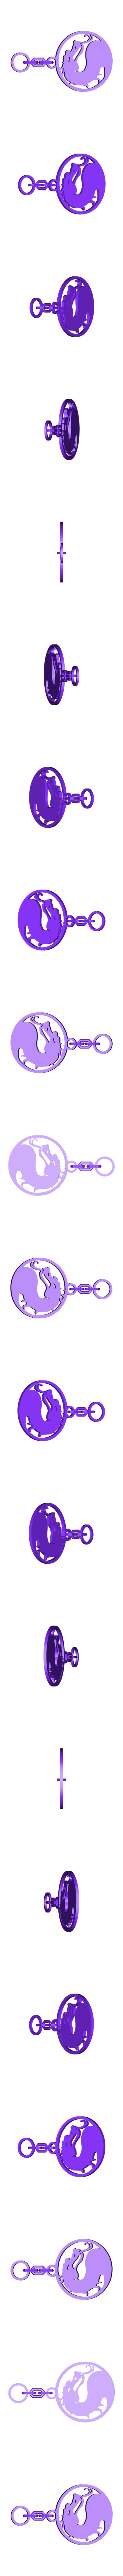 MK_Keyring_2.stl Download free STL file Mortal Kombat Keyrings • 3D printing object, Solid_Alexei